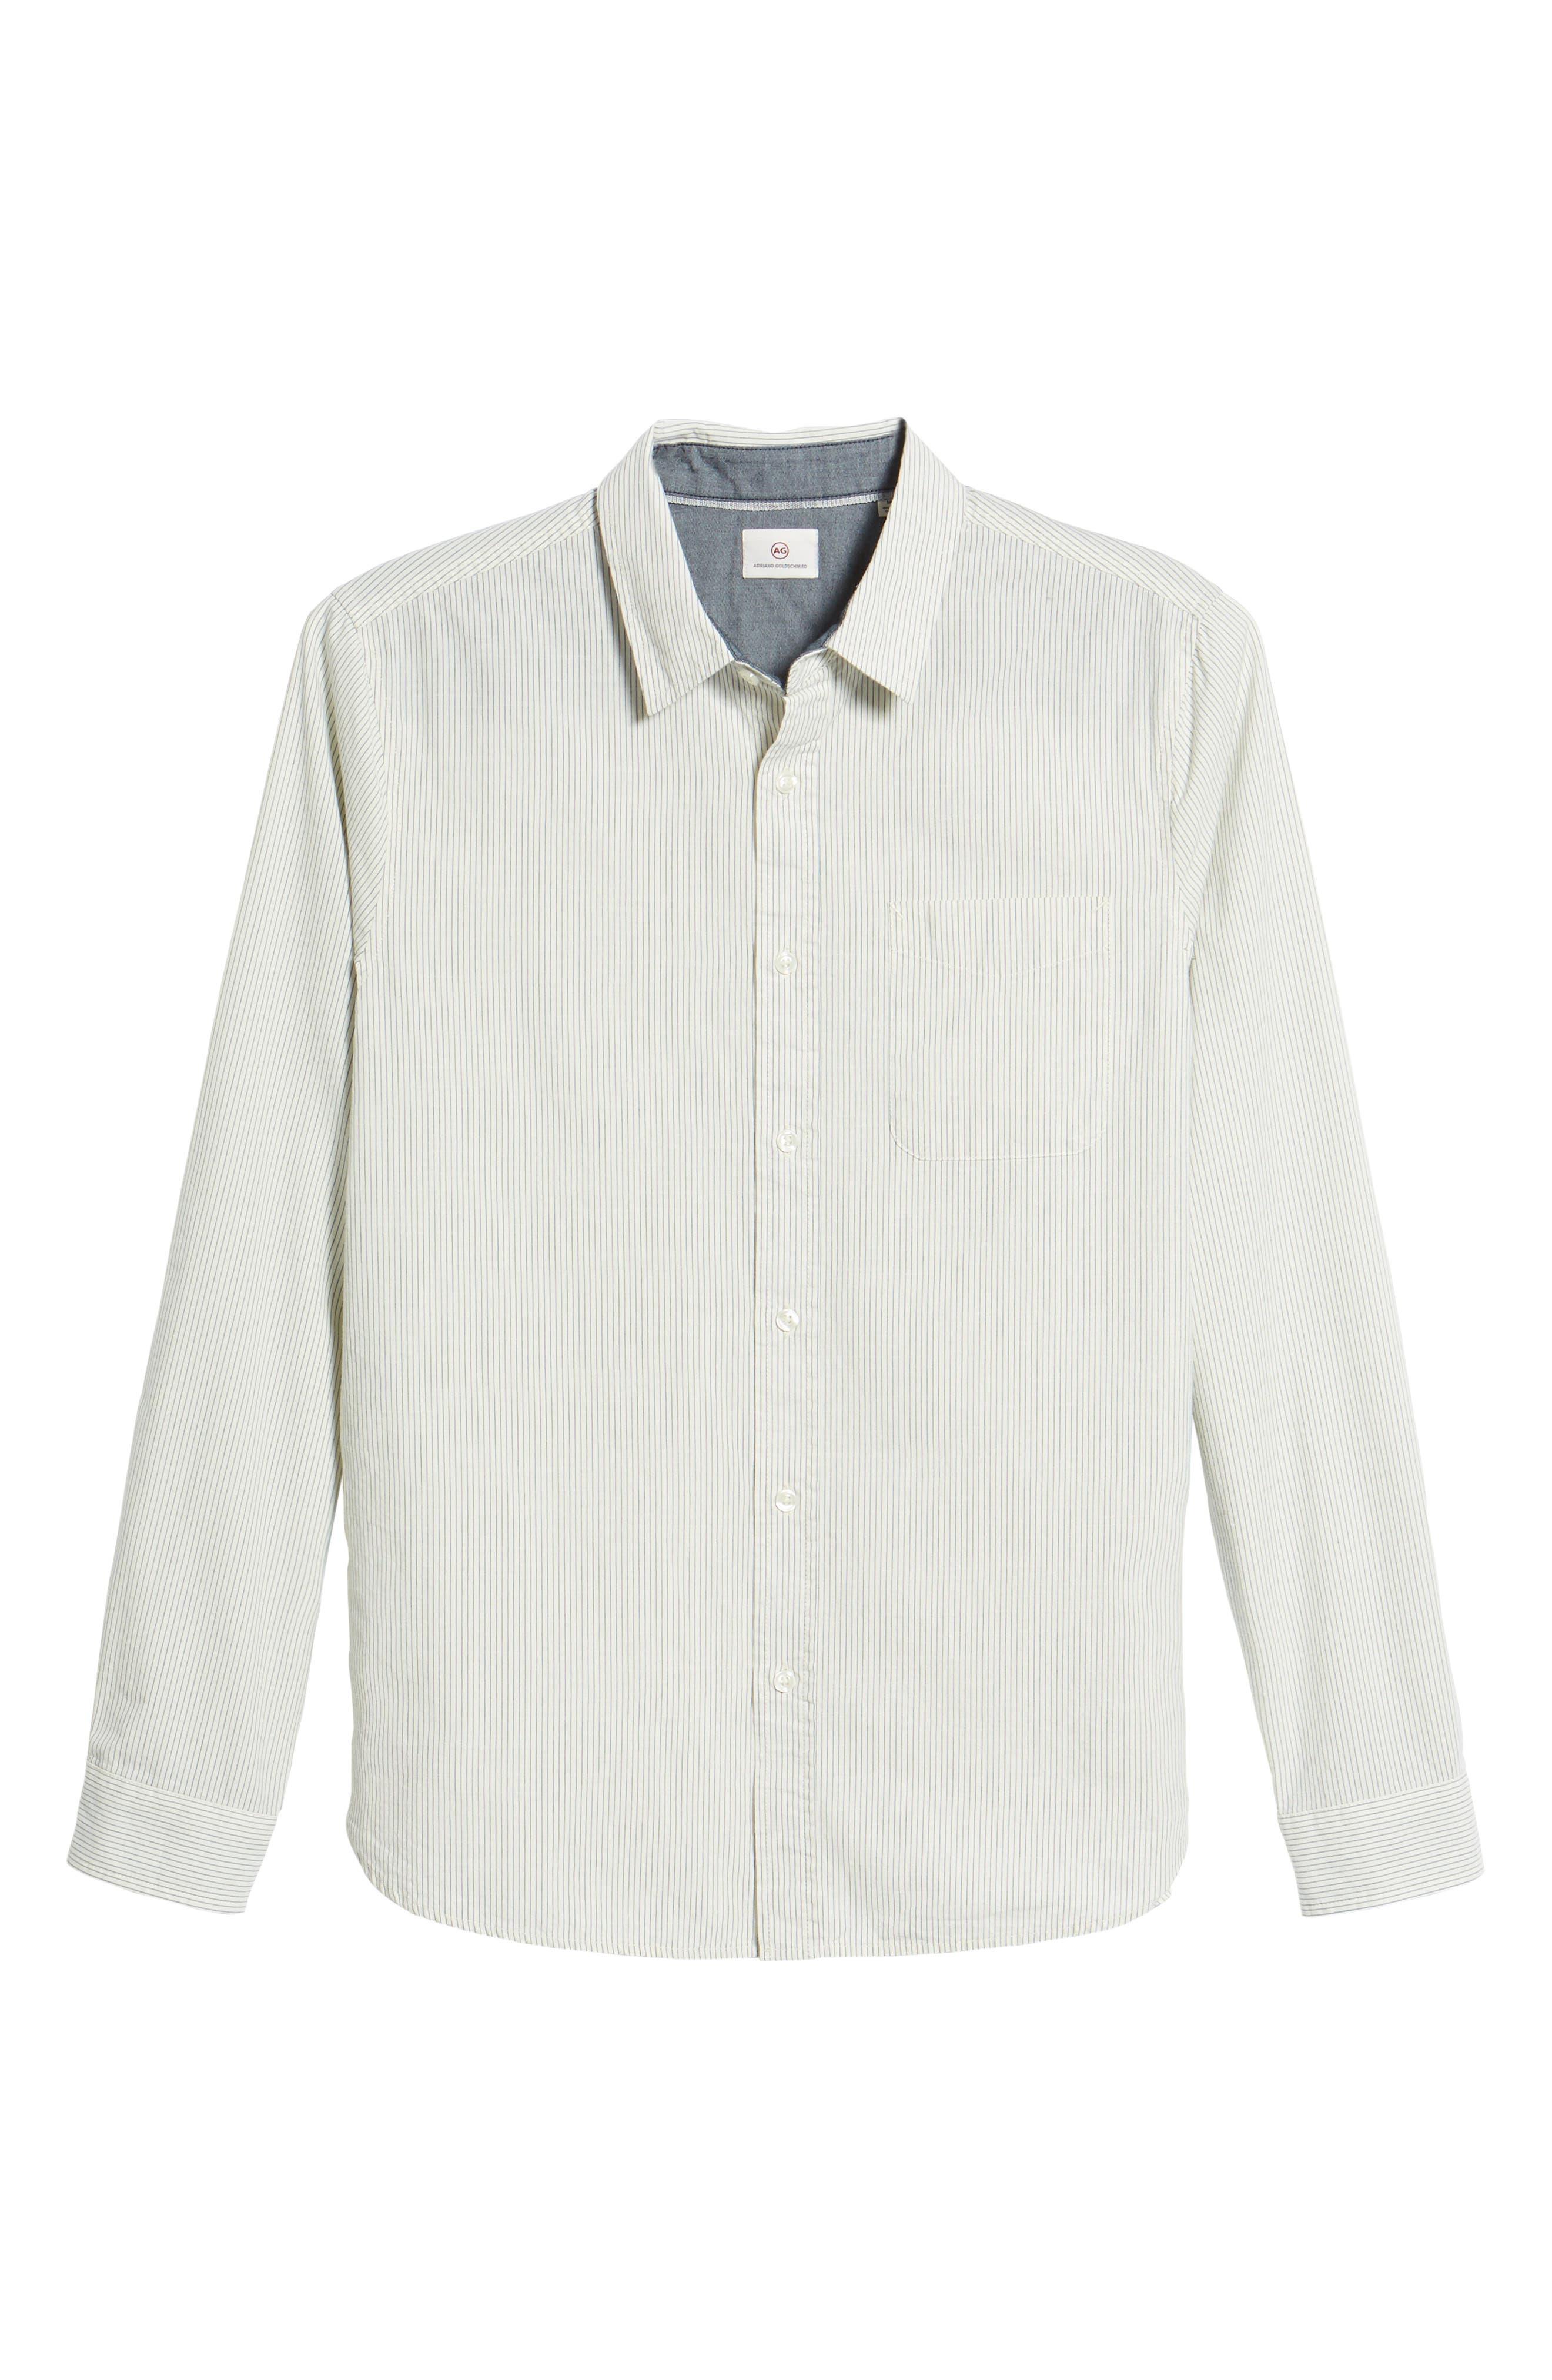 Colton Regular Fit Stripe Sport Shirt,                             Alternate thumbnail 6, color,                             Natural/Mosaic Blue